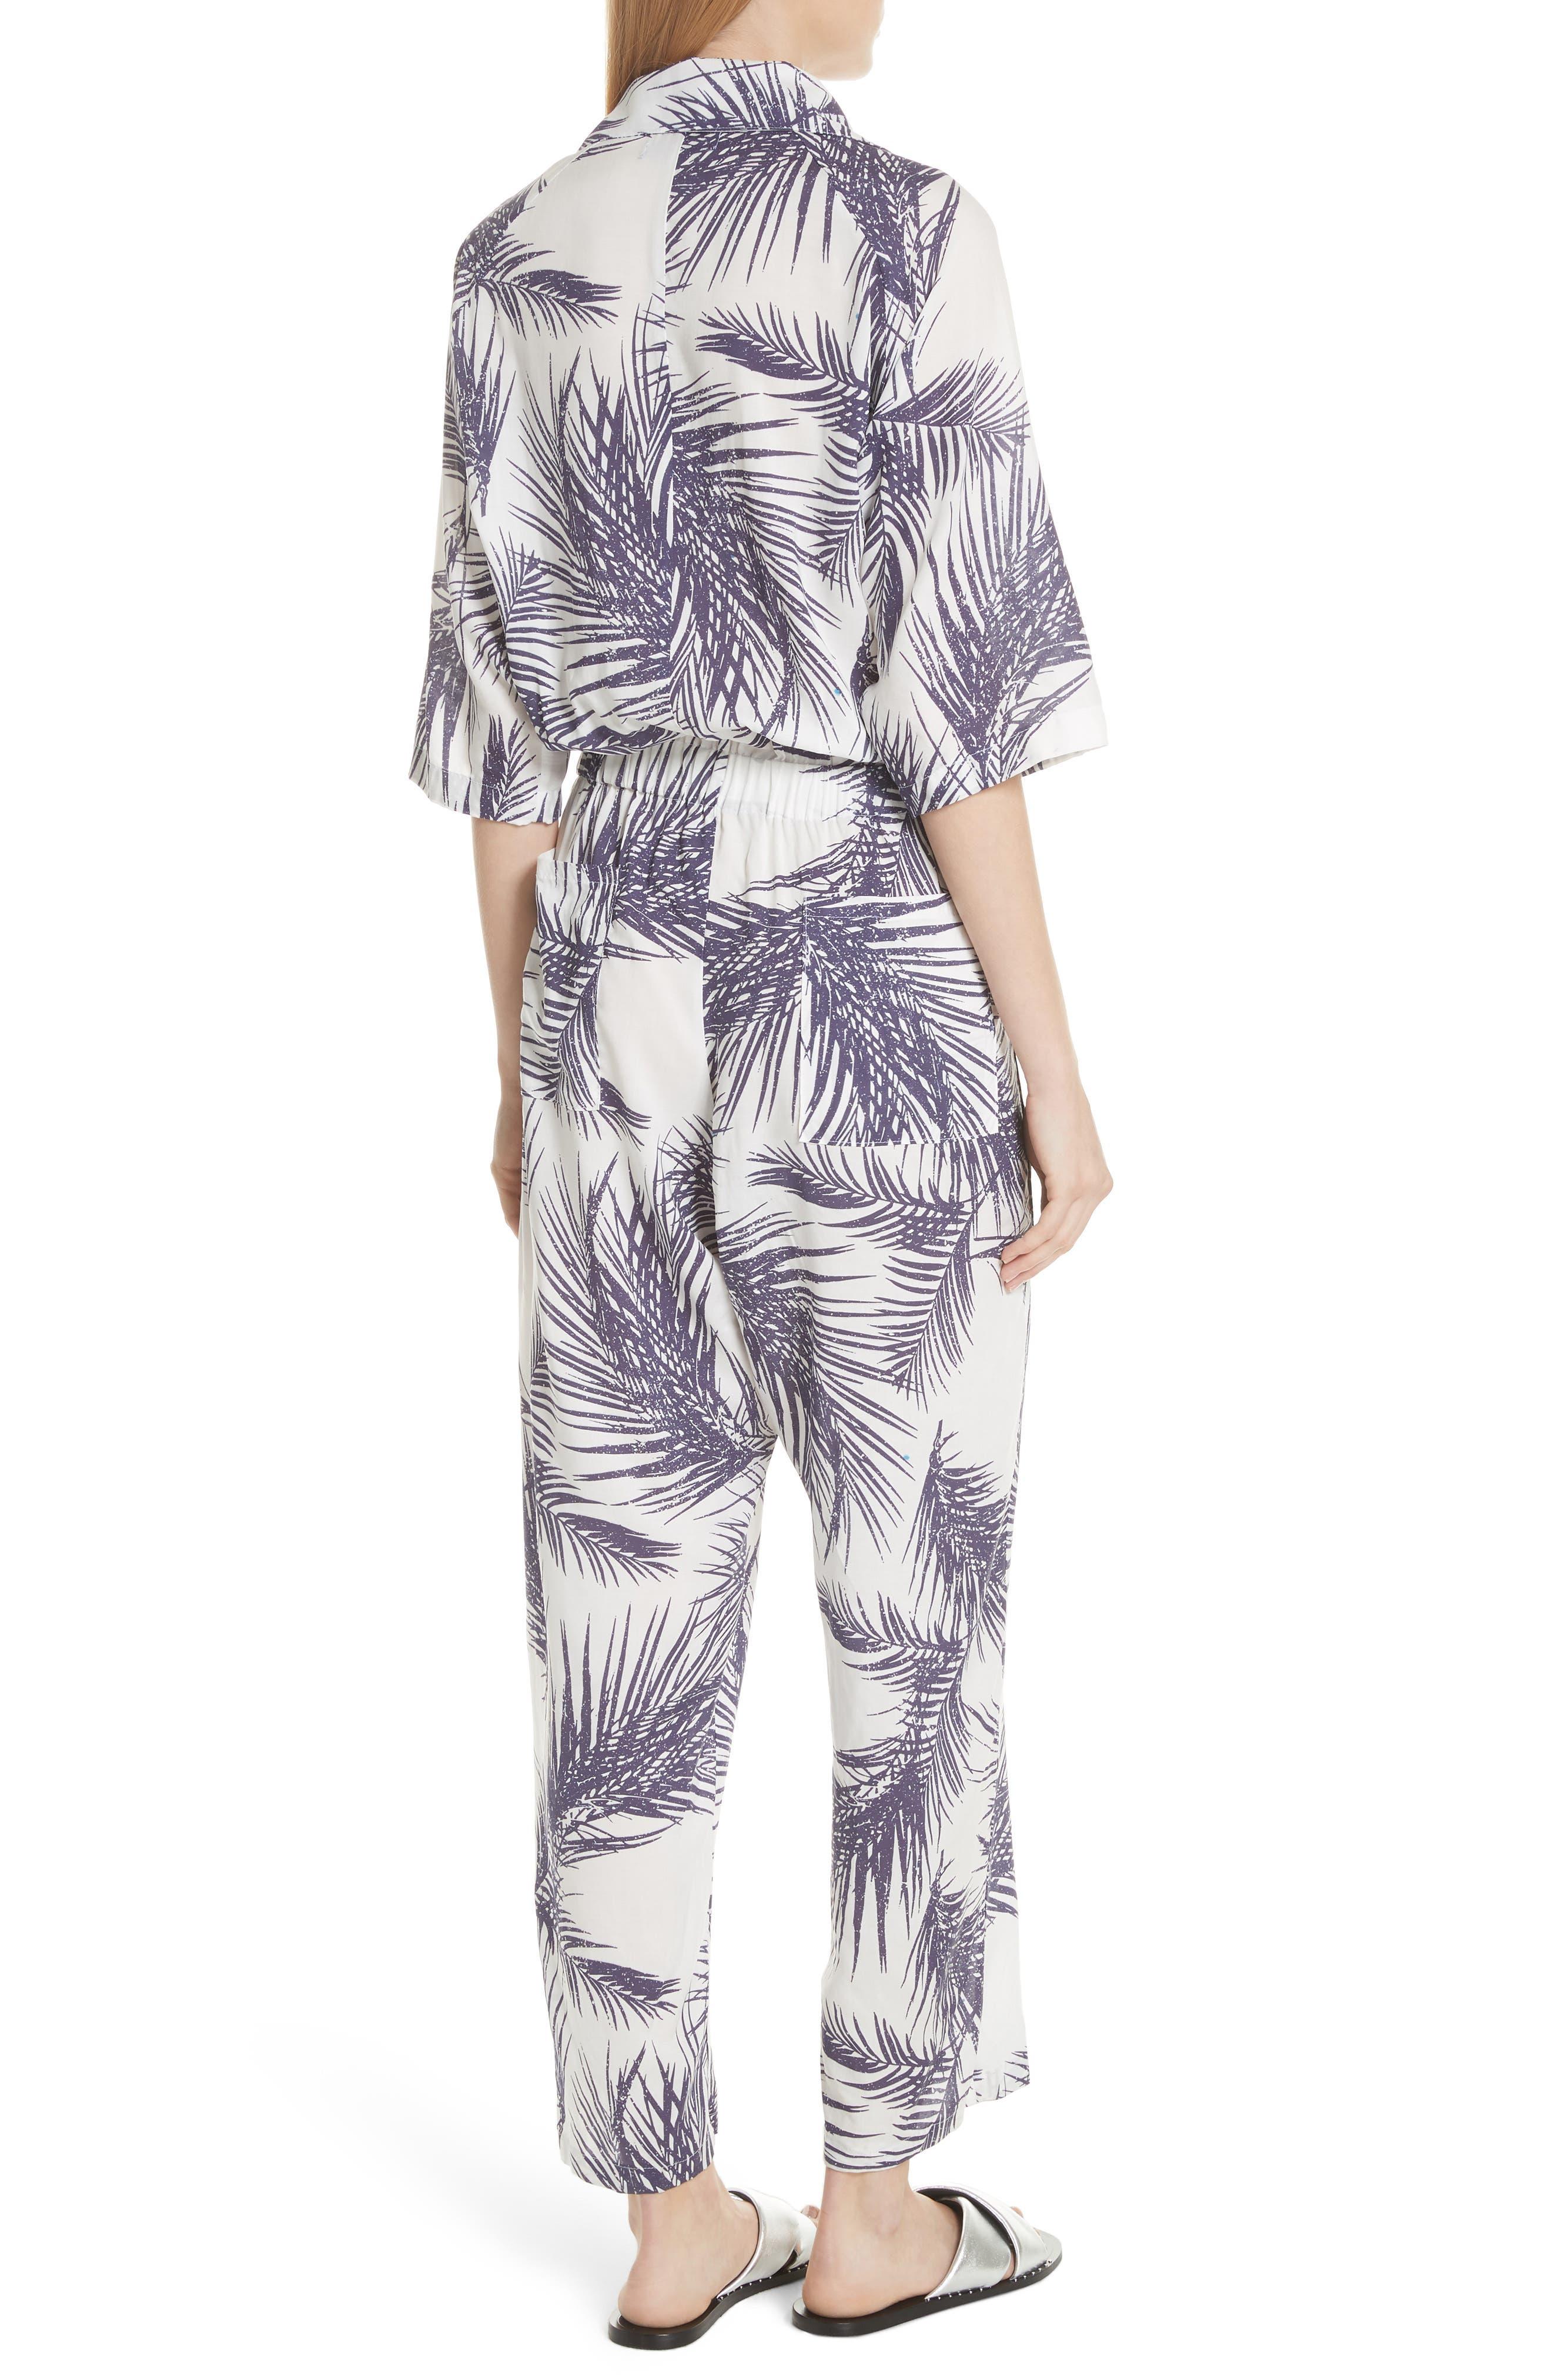 Apres Beach Print Jumpsuit,                             Alternate thumbnail 2, color,                             White/ Dark Purple